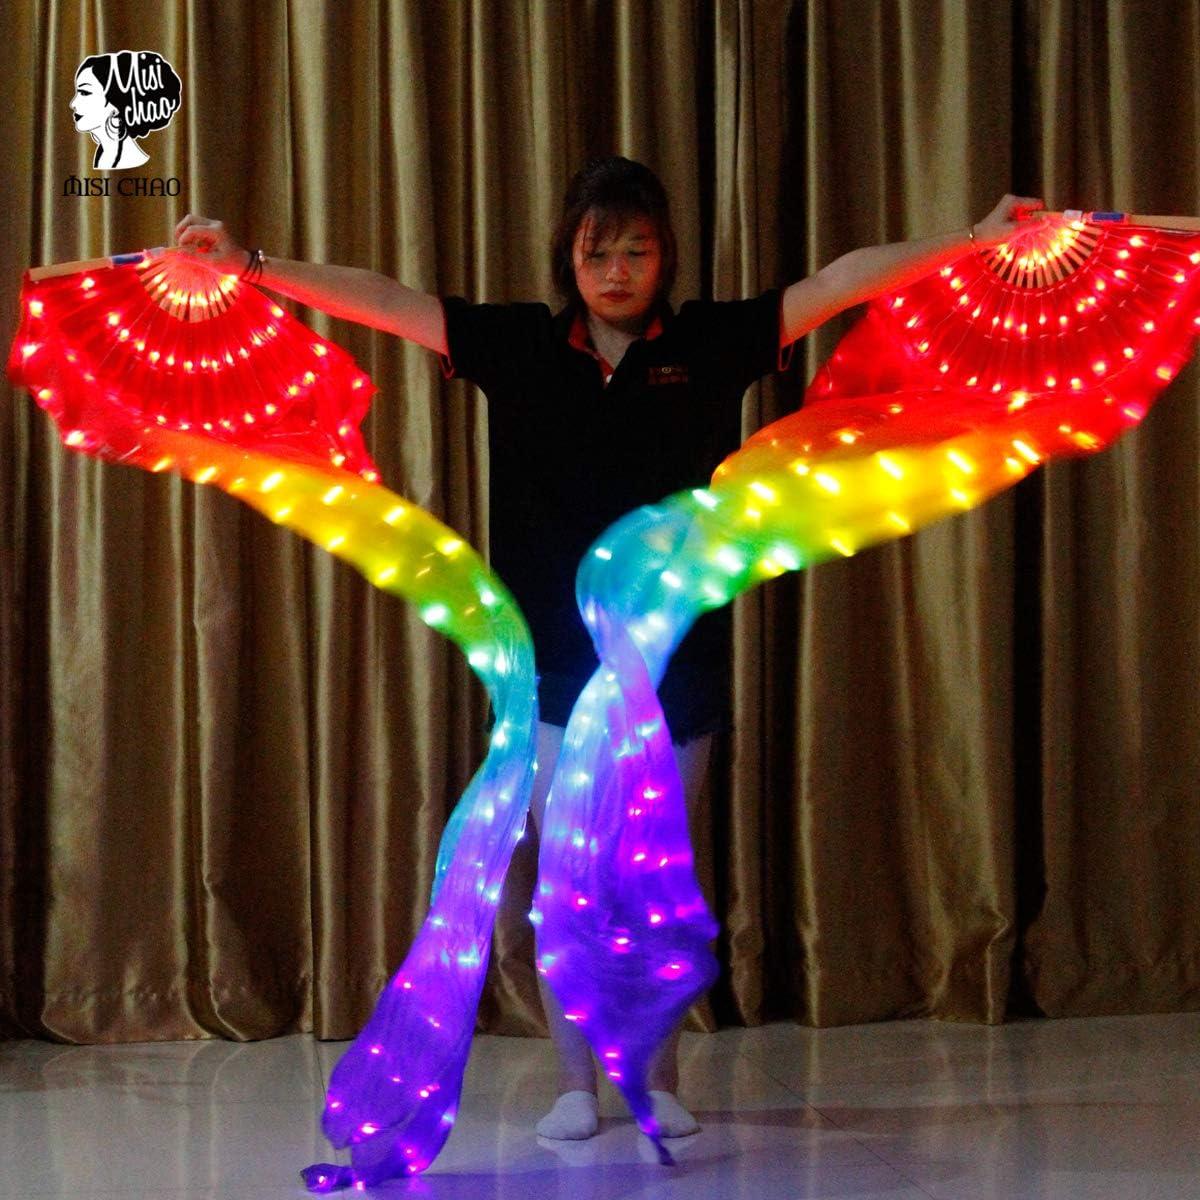 1.8 Long Bamboo Fans Veil Hand Made Silk Fan for Dance//Outdoor MISI CHAO Belly Dance LED Fan Veil